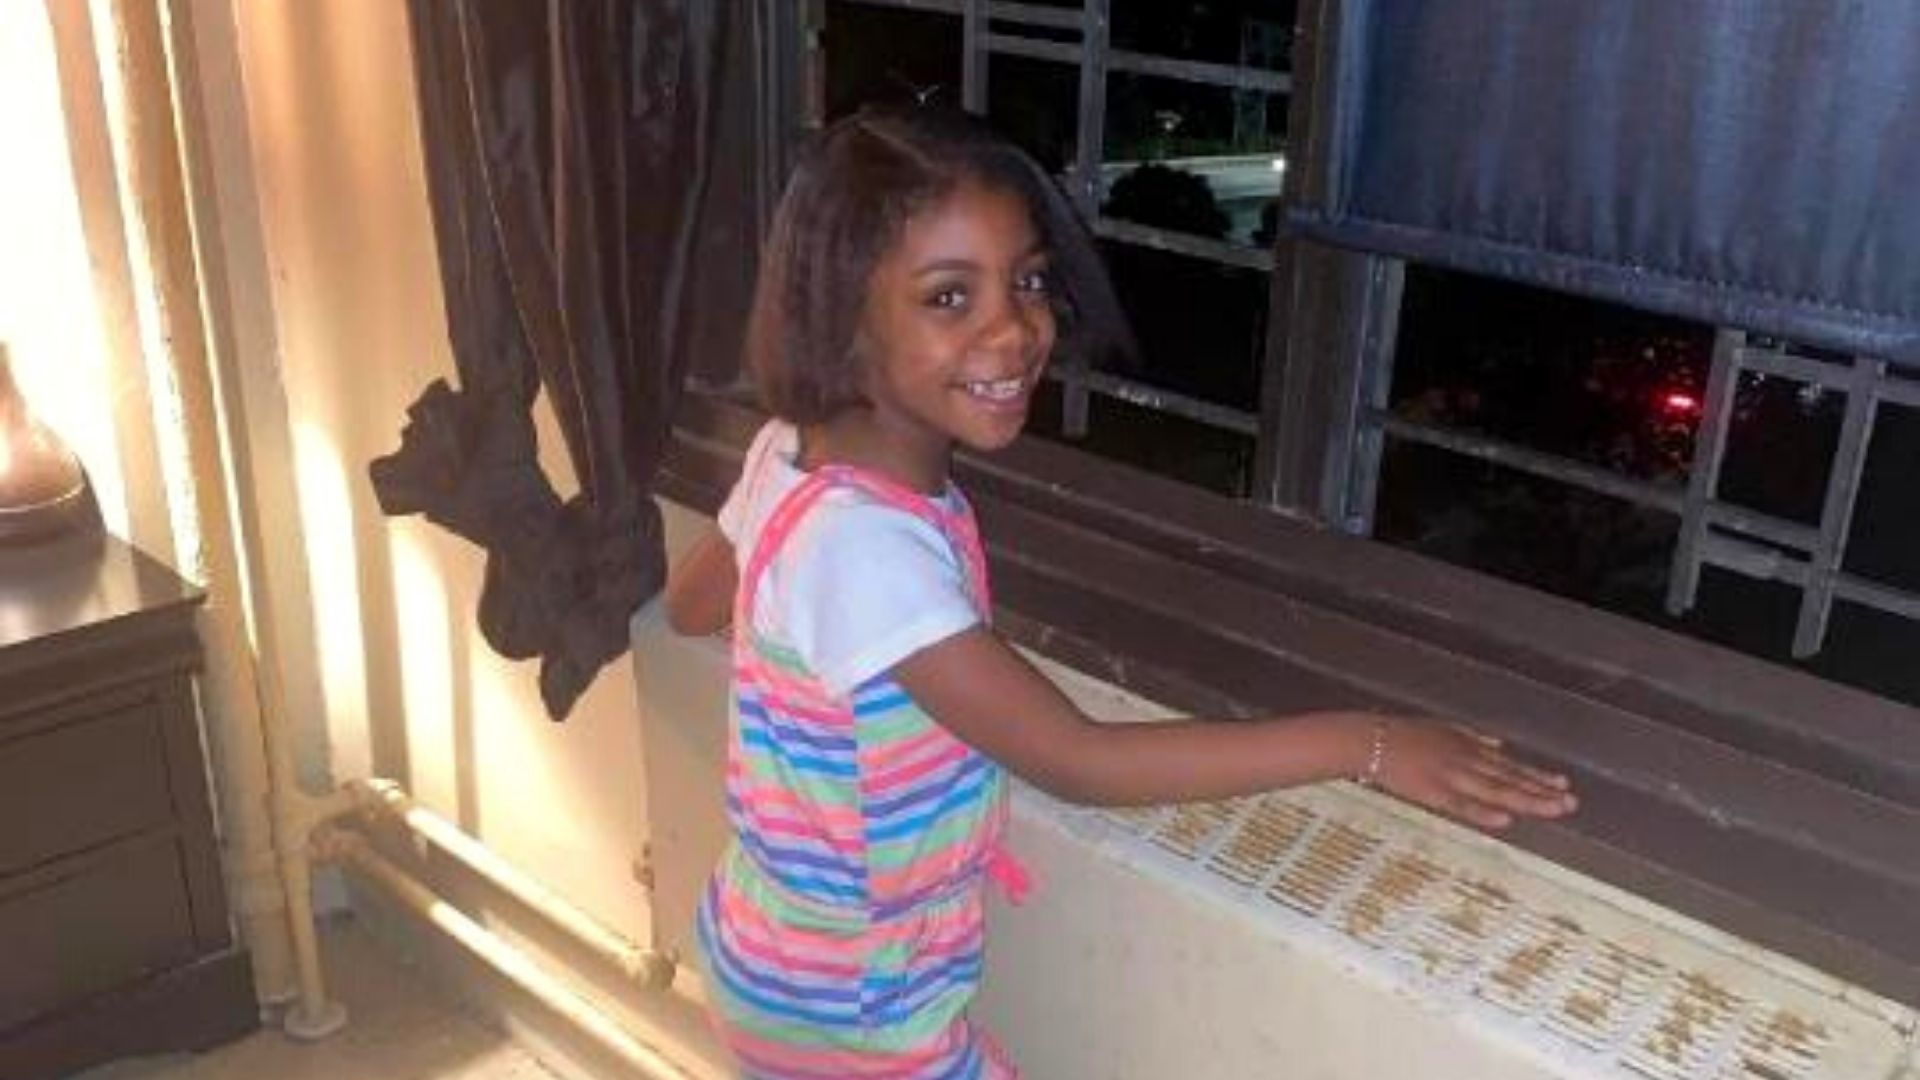 7-year-old Julissia Batties found dead in Bronx apartment